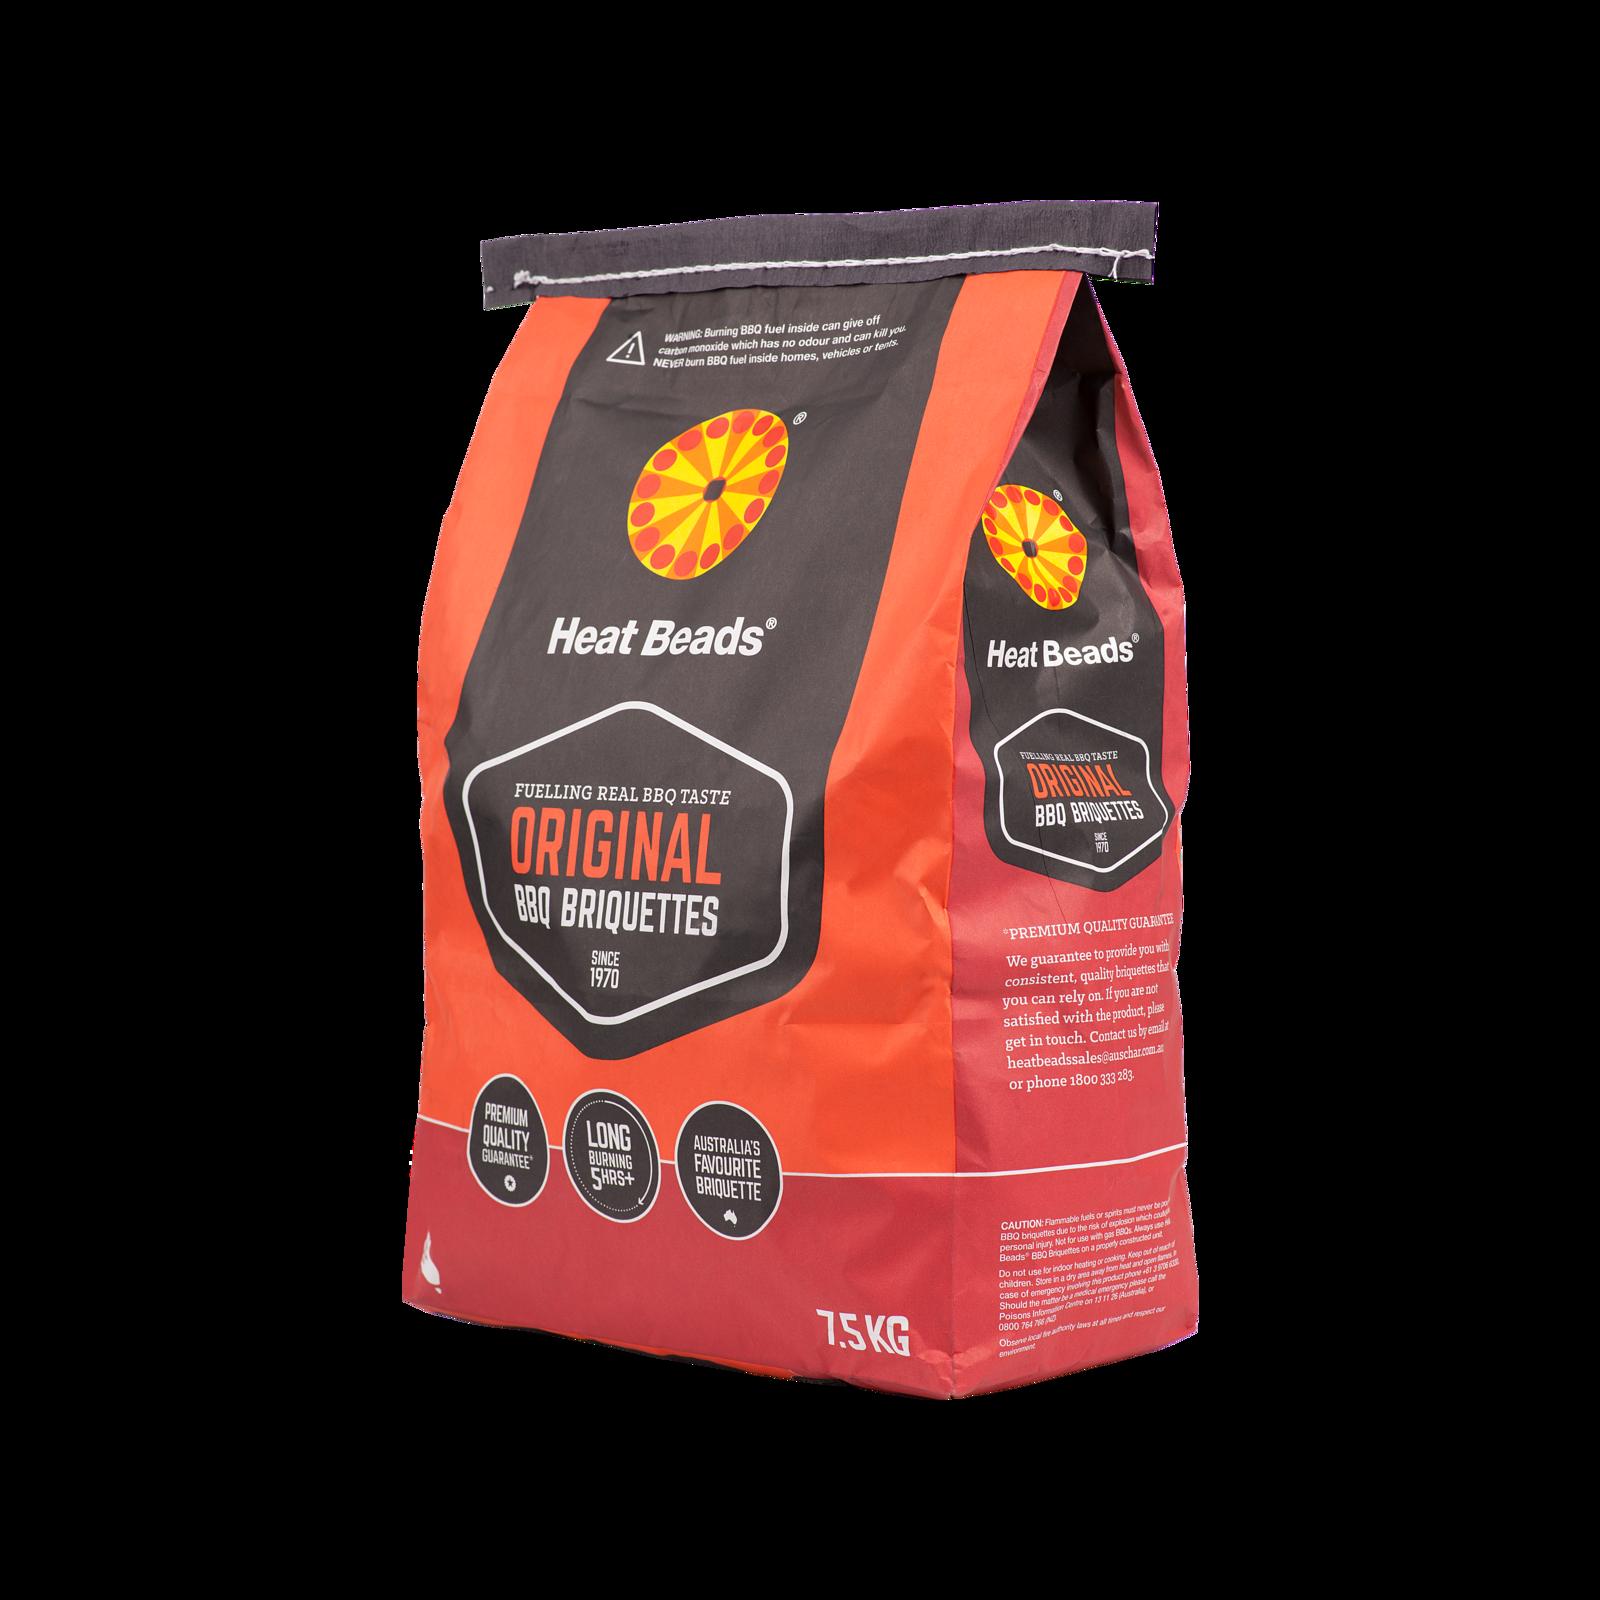 Heat Beads® 7.5kg Original BBQ Briquettes